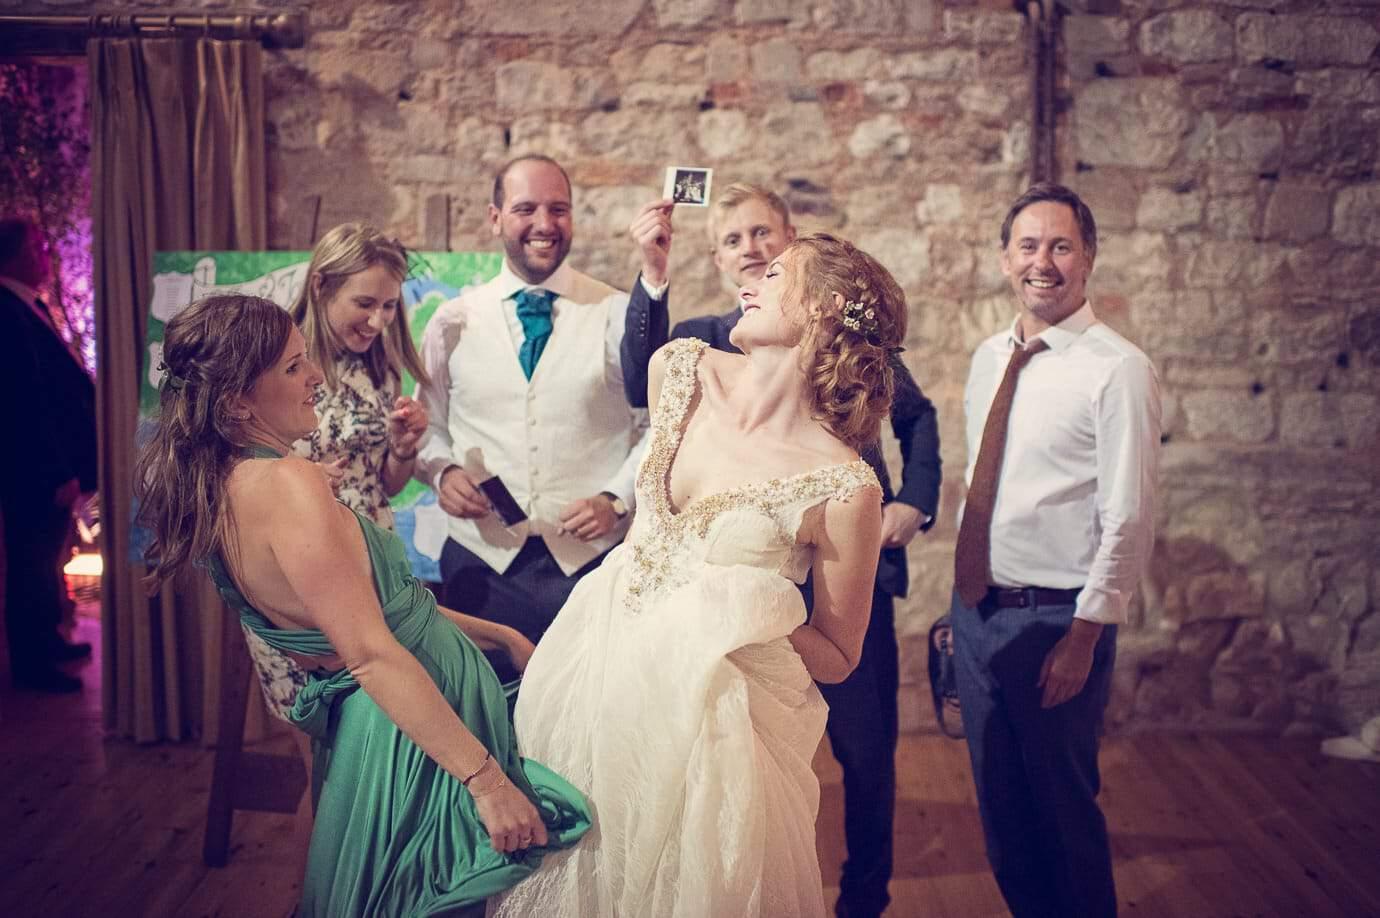 One Thousand Words Lulworth Castle Wedding Photographers photo of bride dancing